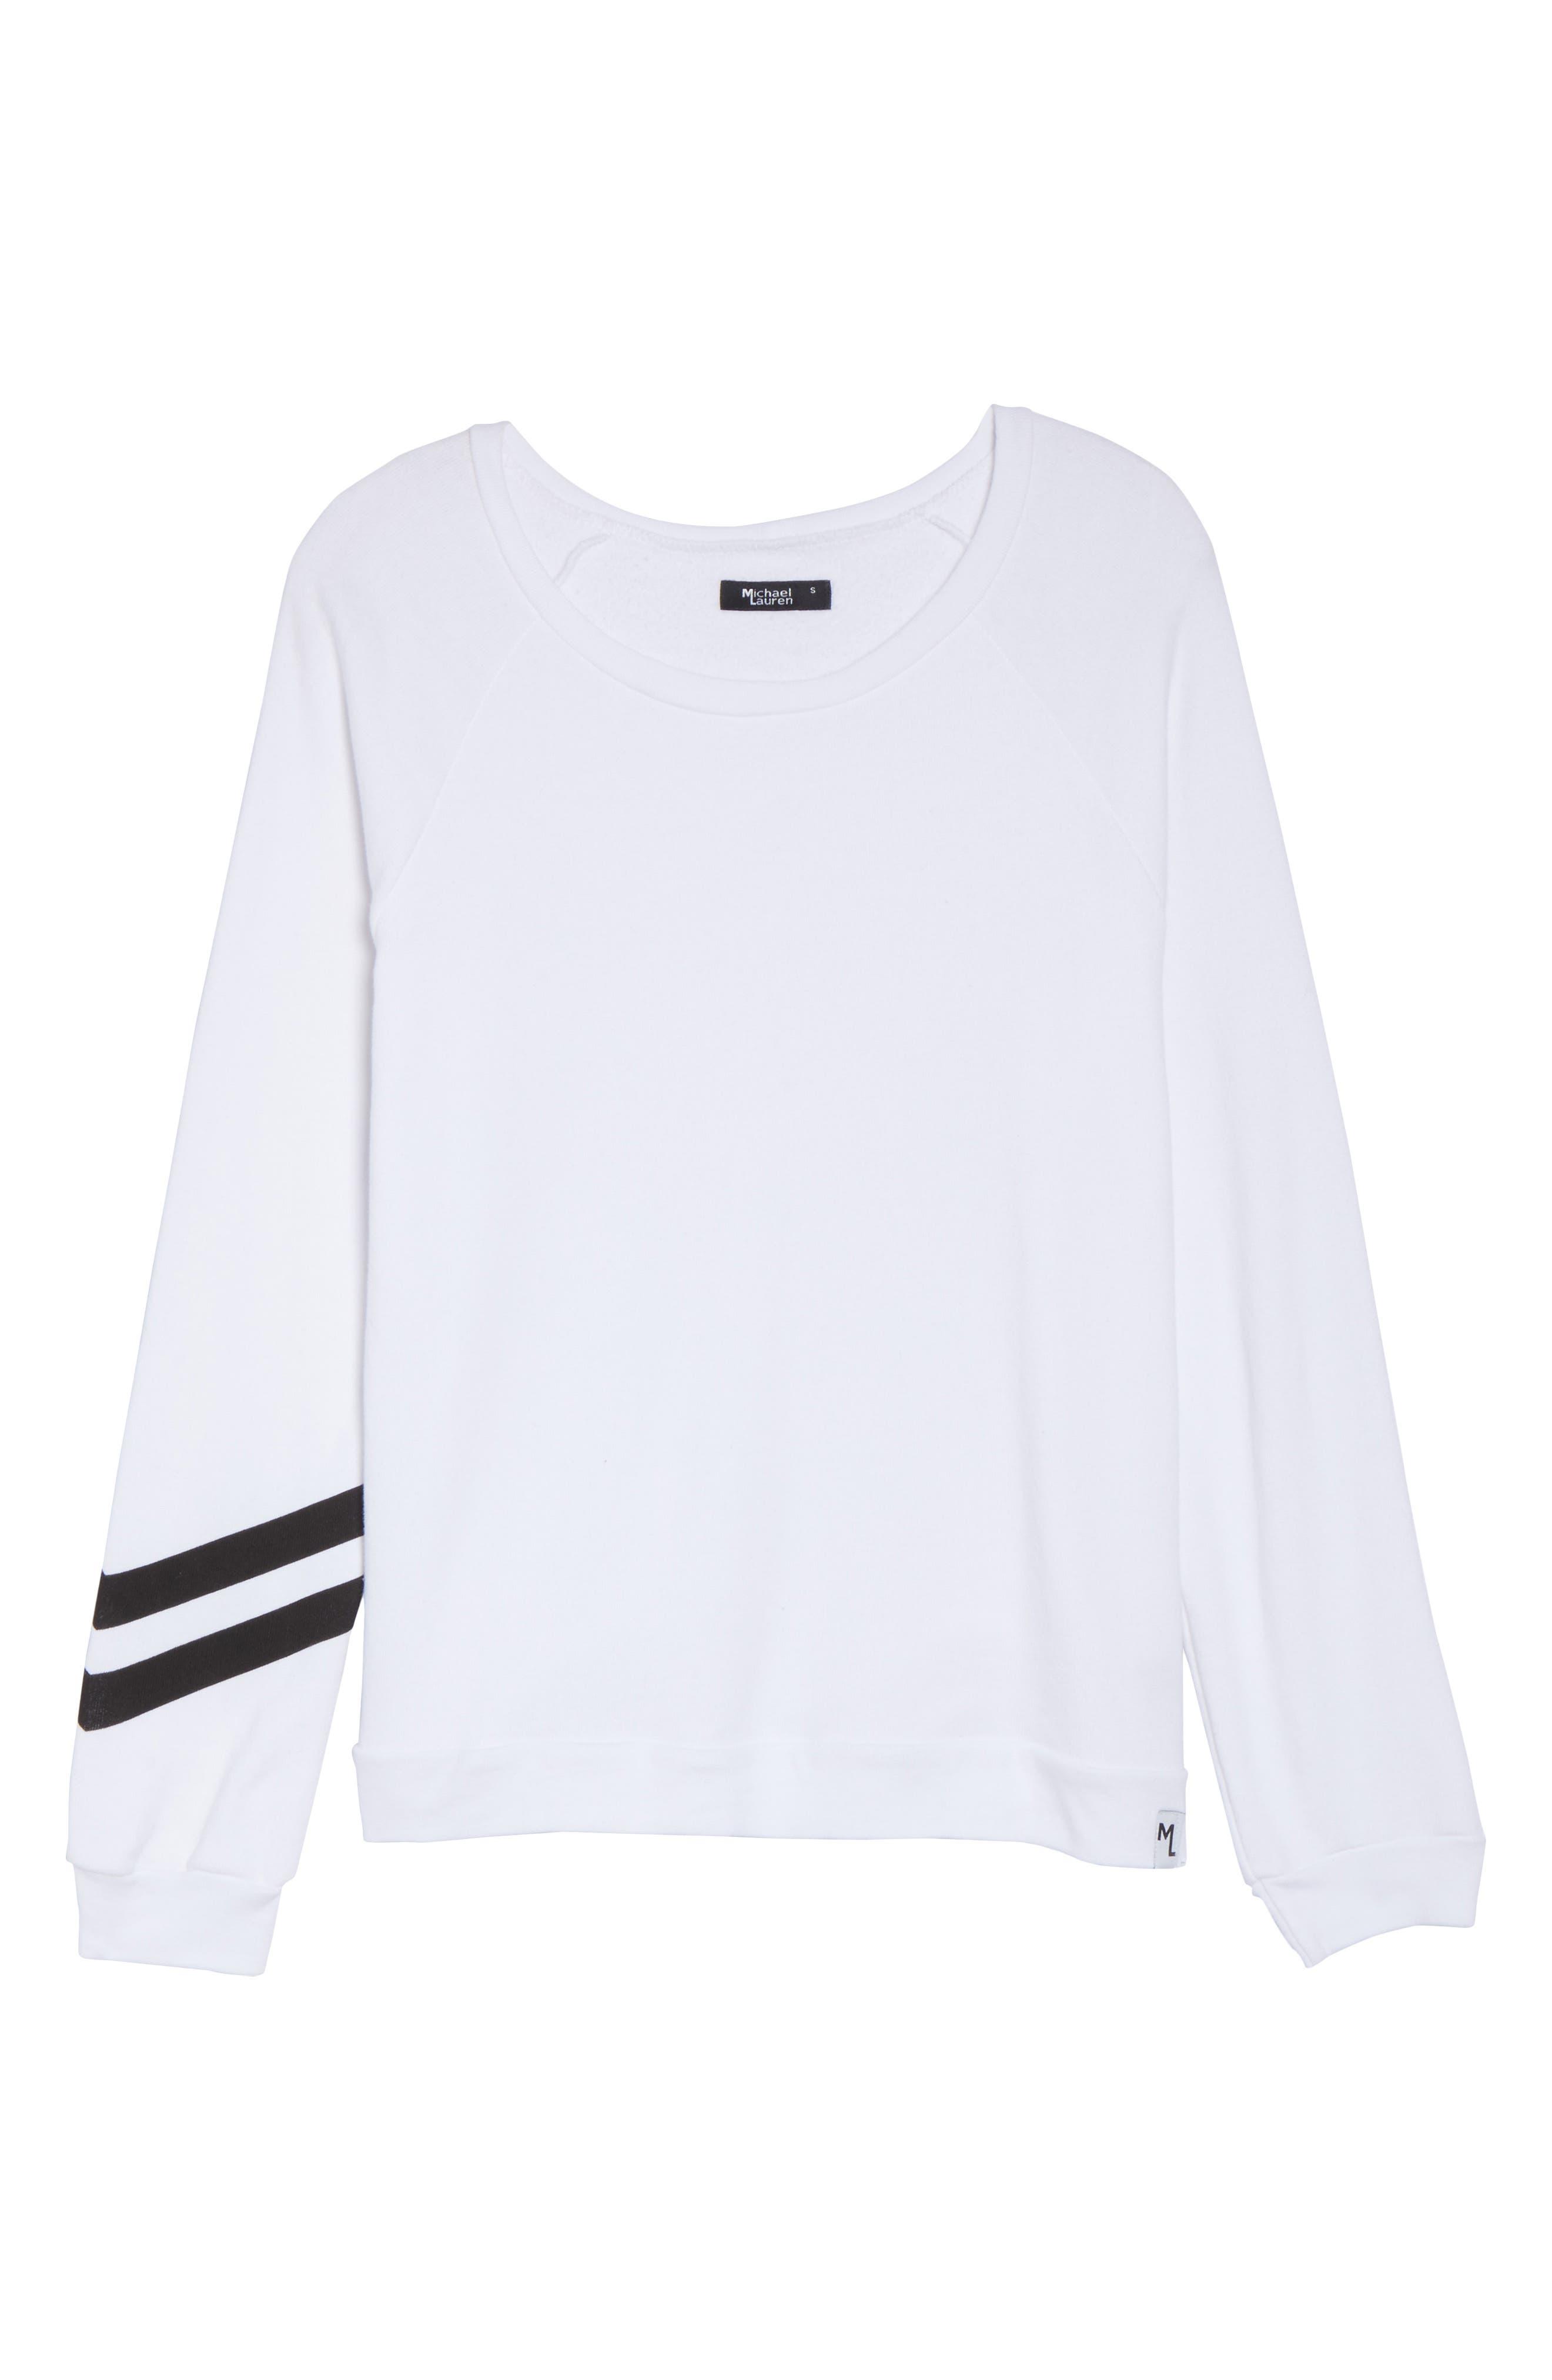 Oswald Vintage Sweatshirt,                             Alternate thumbnail 6, color,                             100